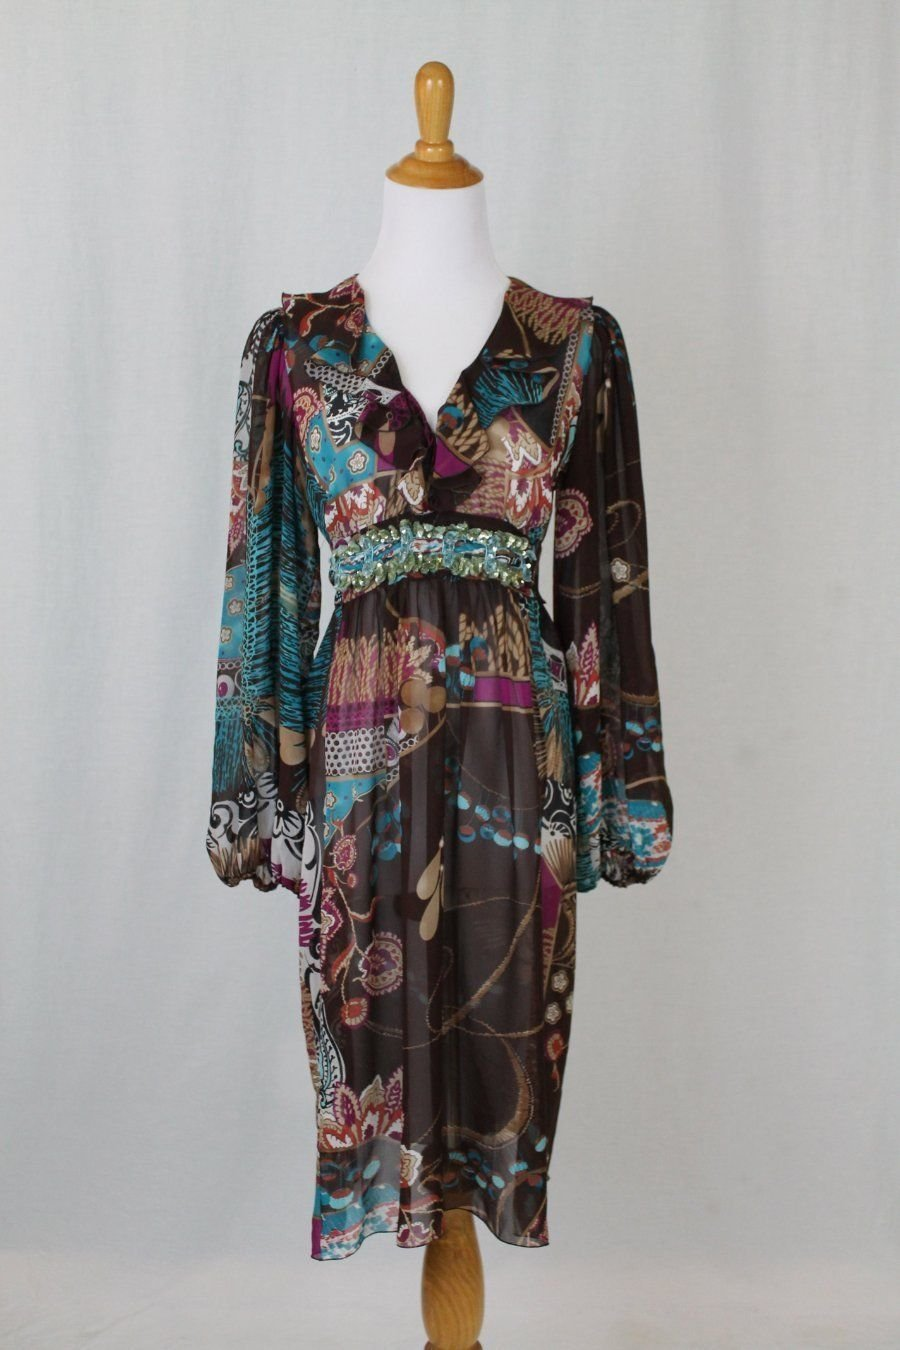 BLUMARINE Embellished Silk Chiffon Long Sleeved Below the Knee Dress 42 S